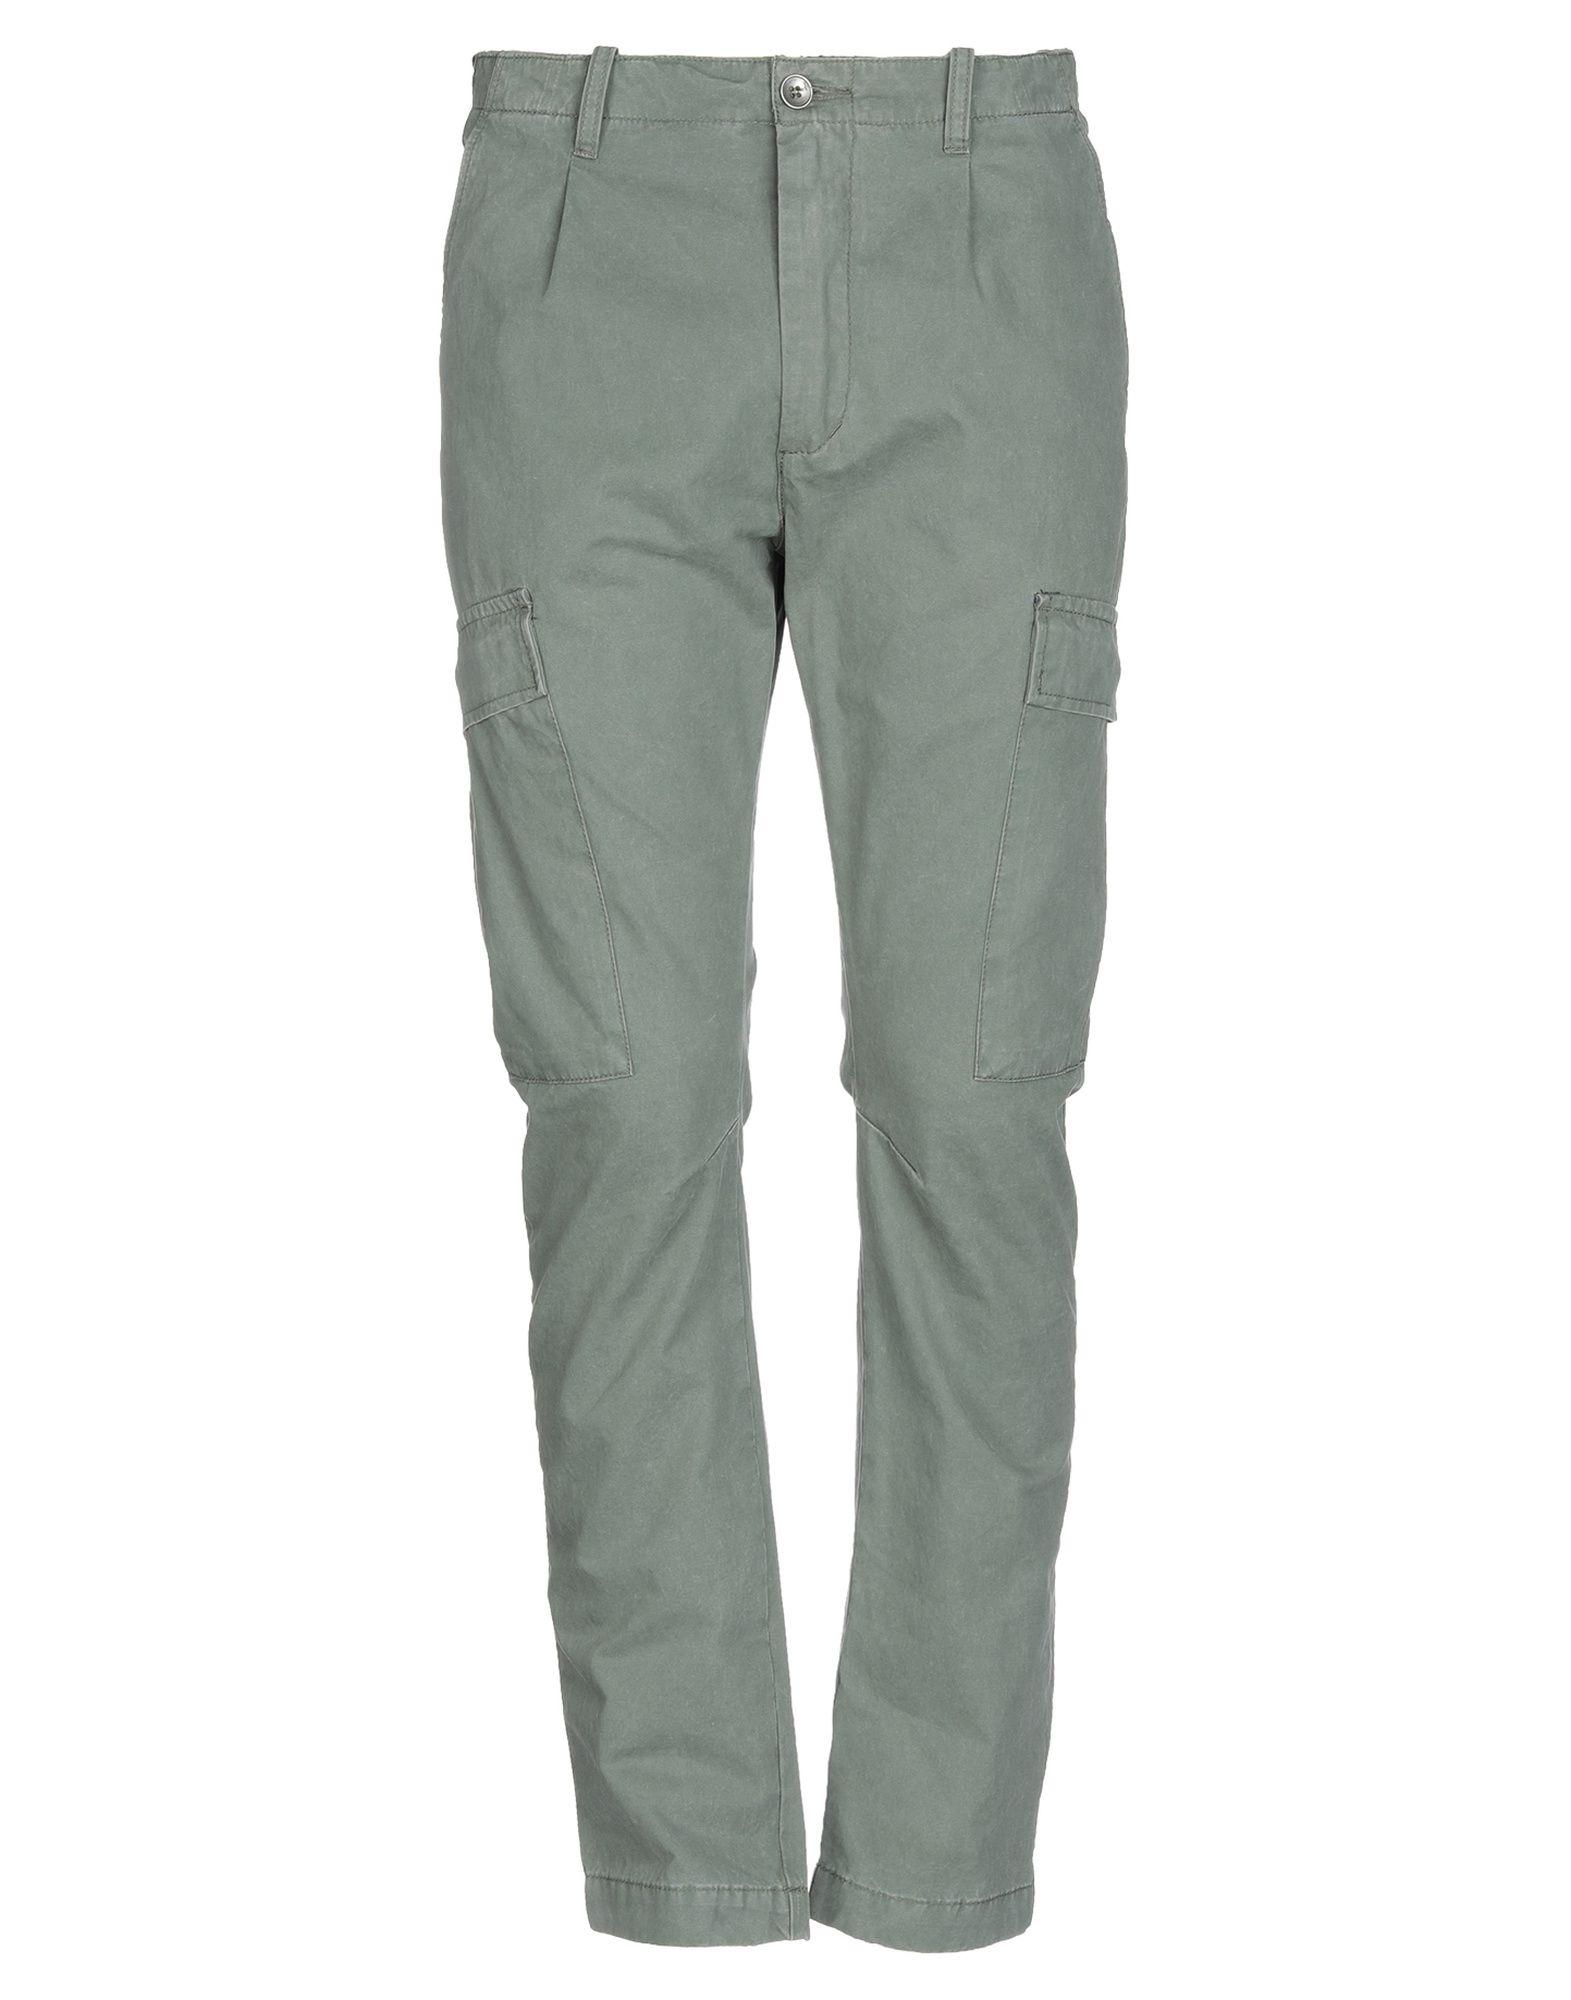 CLARK JEANS Повседневные брюки new original ub4000 30gm e4 v15 warranty for two year